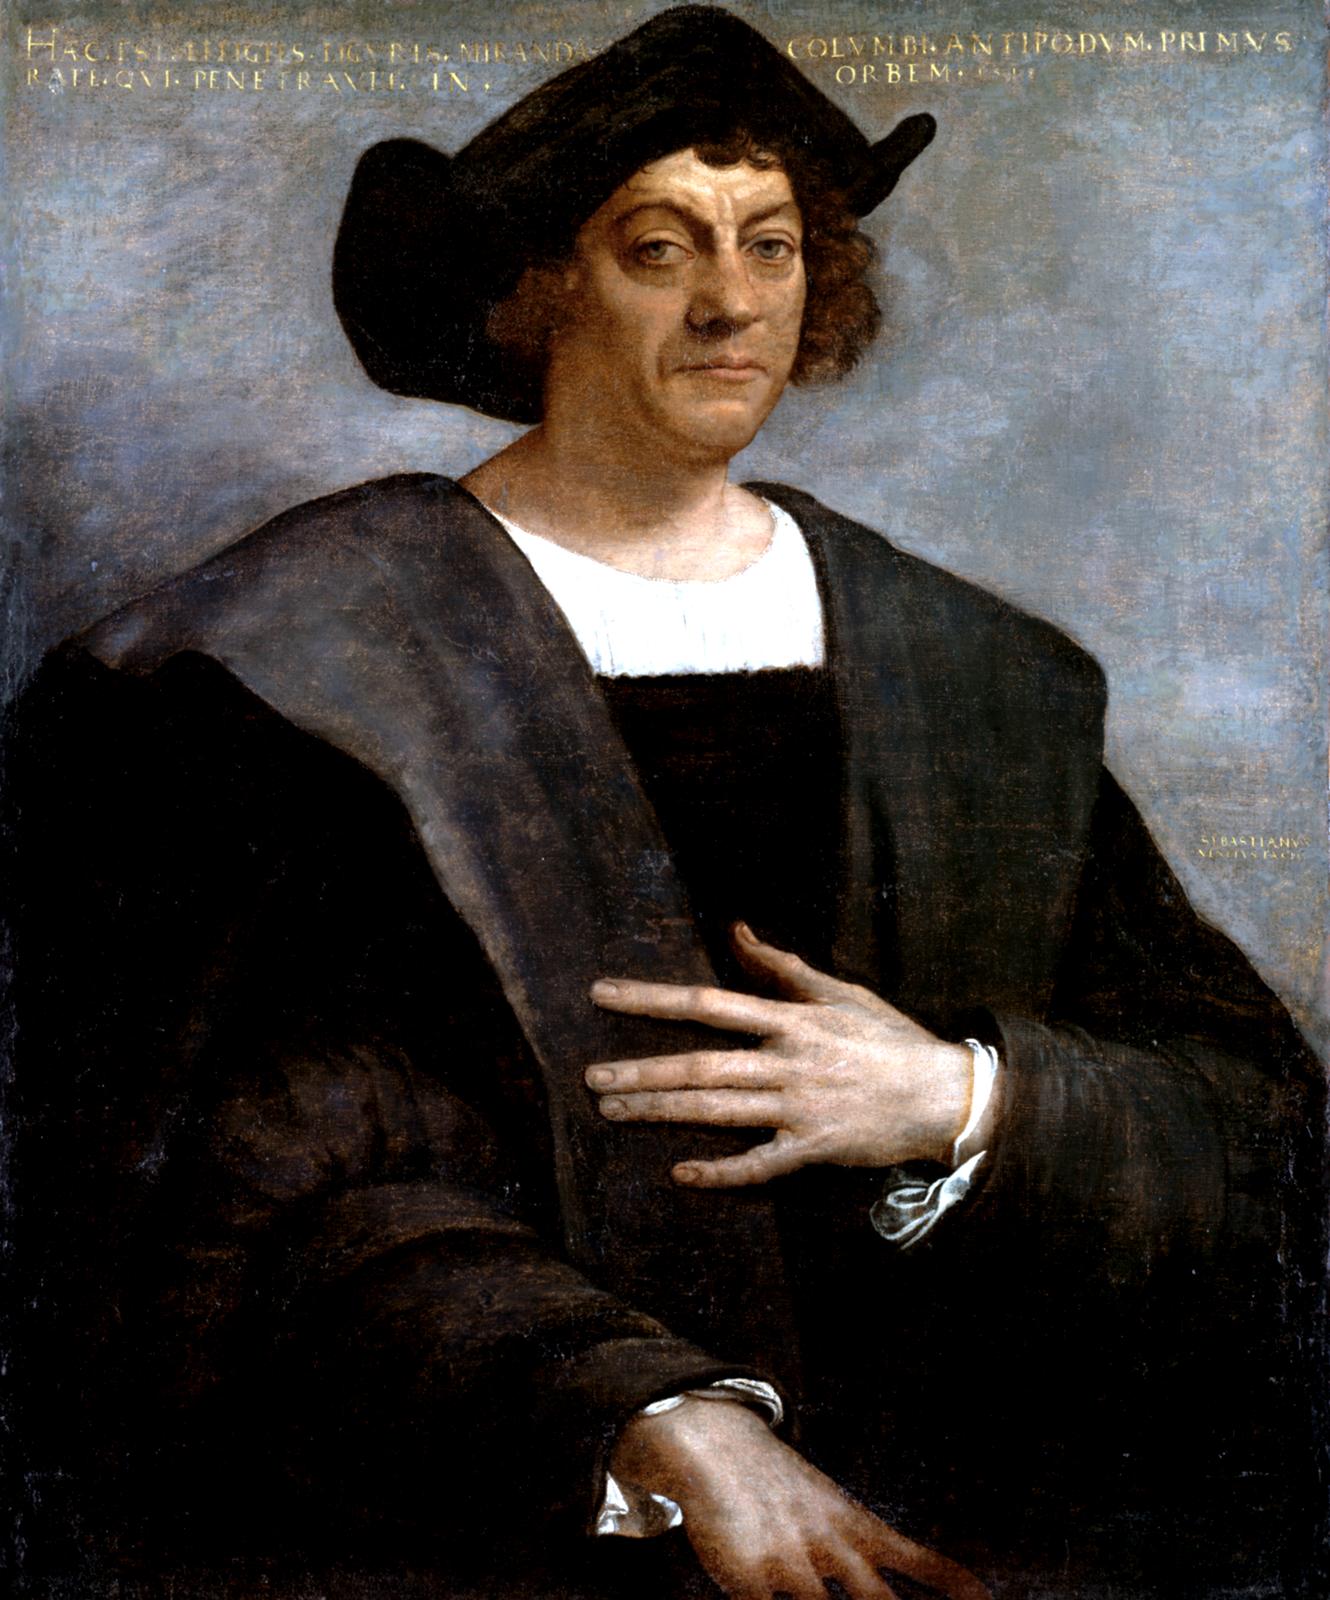 Krzysztof Kolumb Źródło: Sebastiano del Piombo, Krzysztof Kolumb, 1519, Metropolitan Museum of Art, domena publiczna.